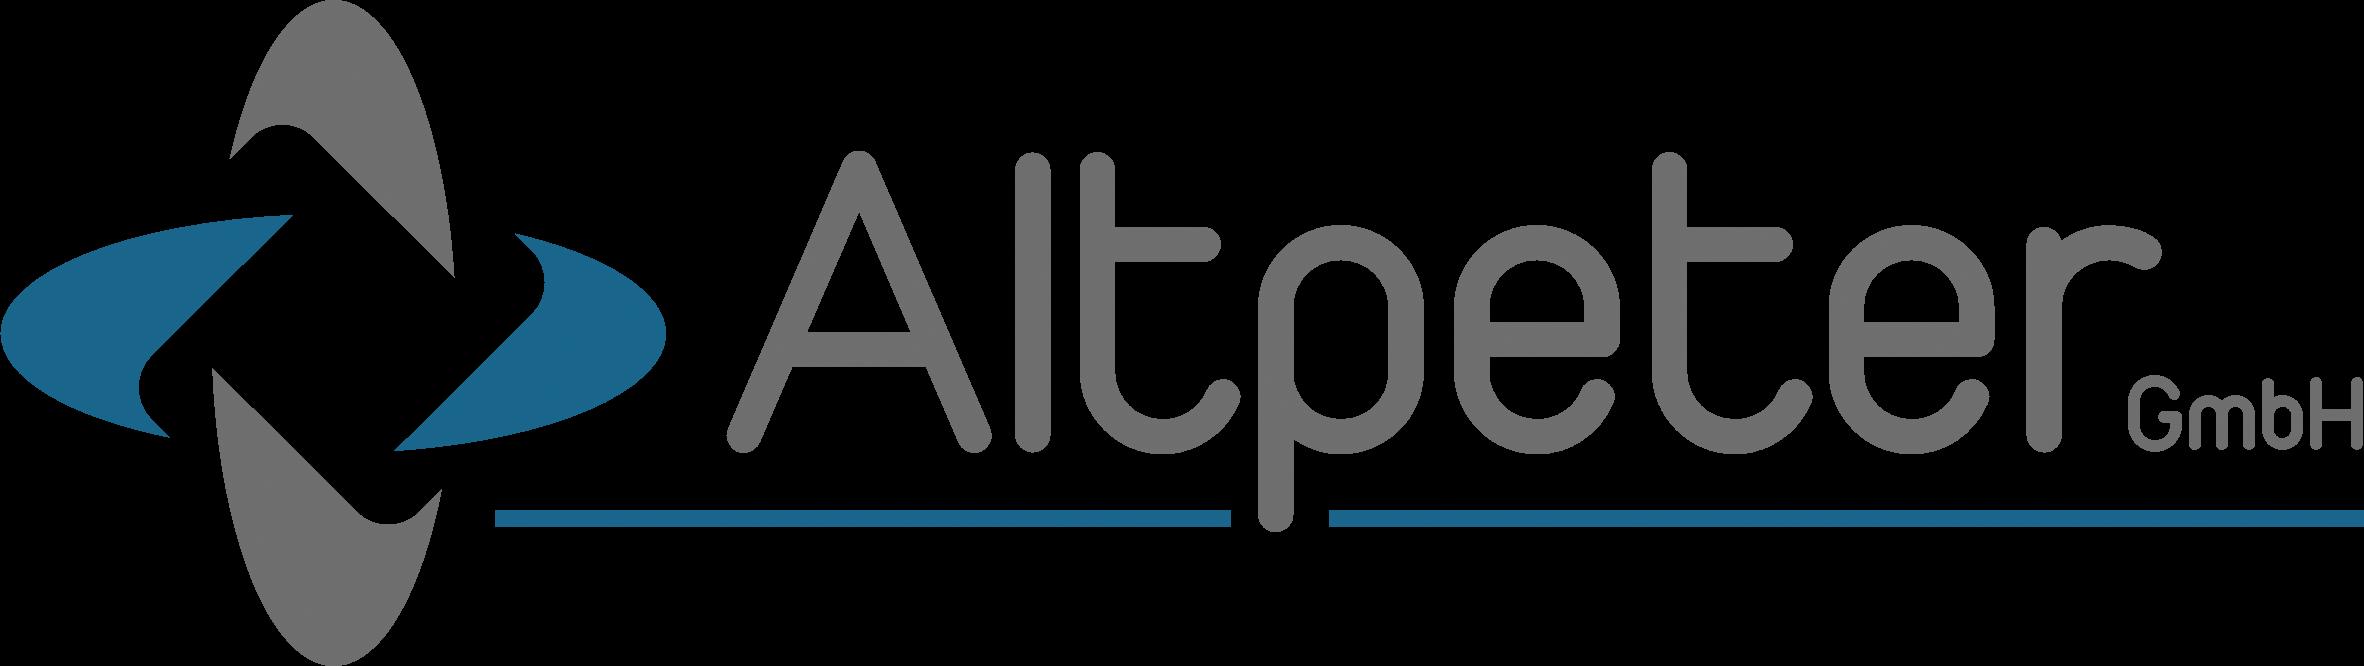 Altpeter GmbH